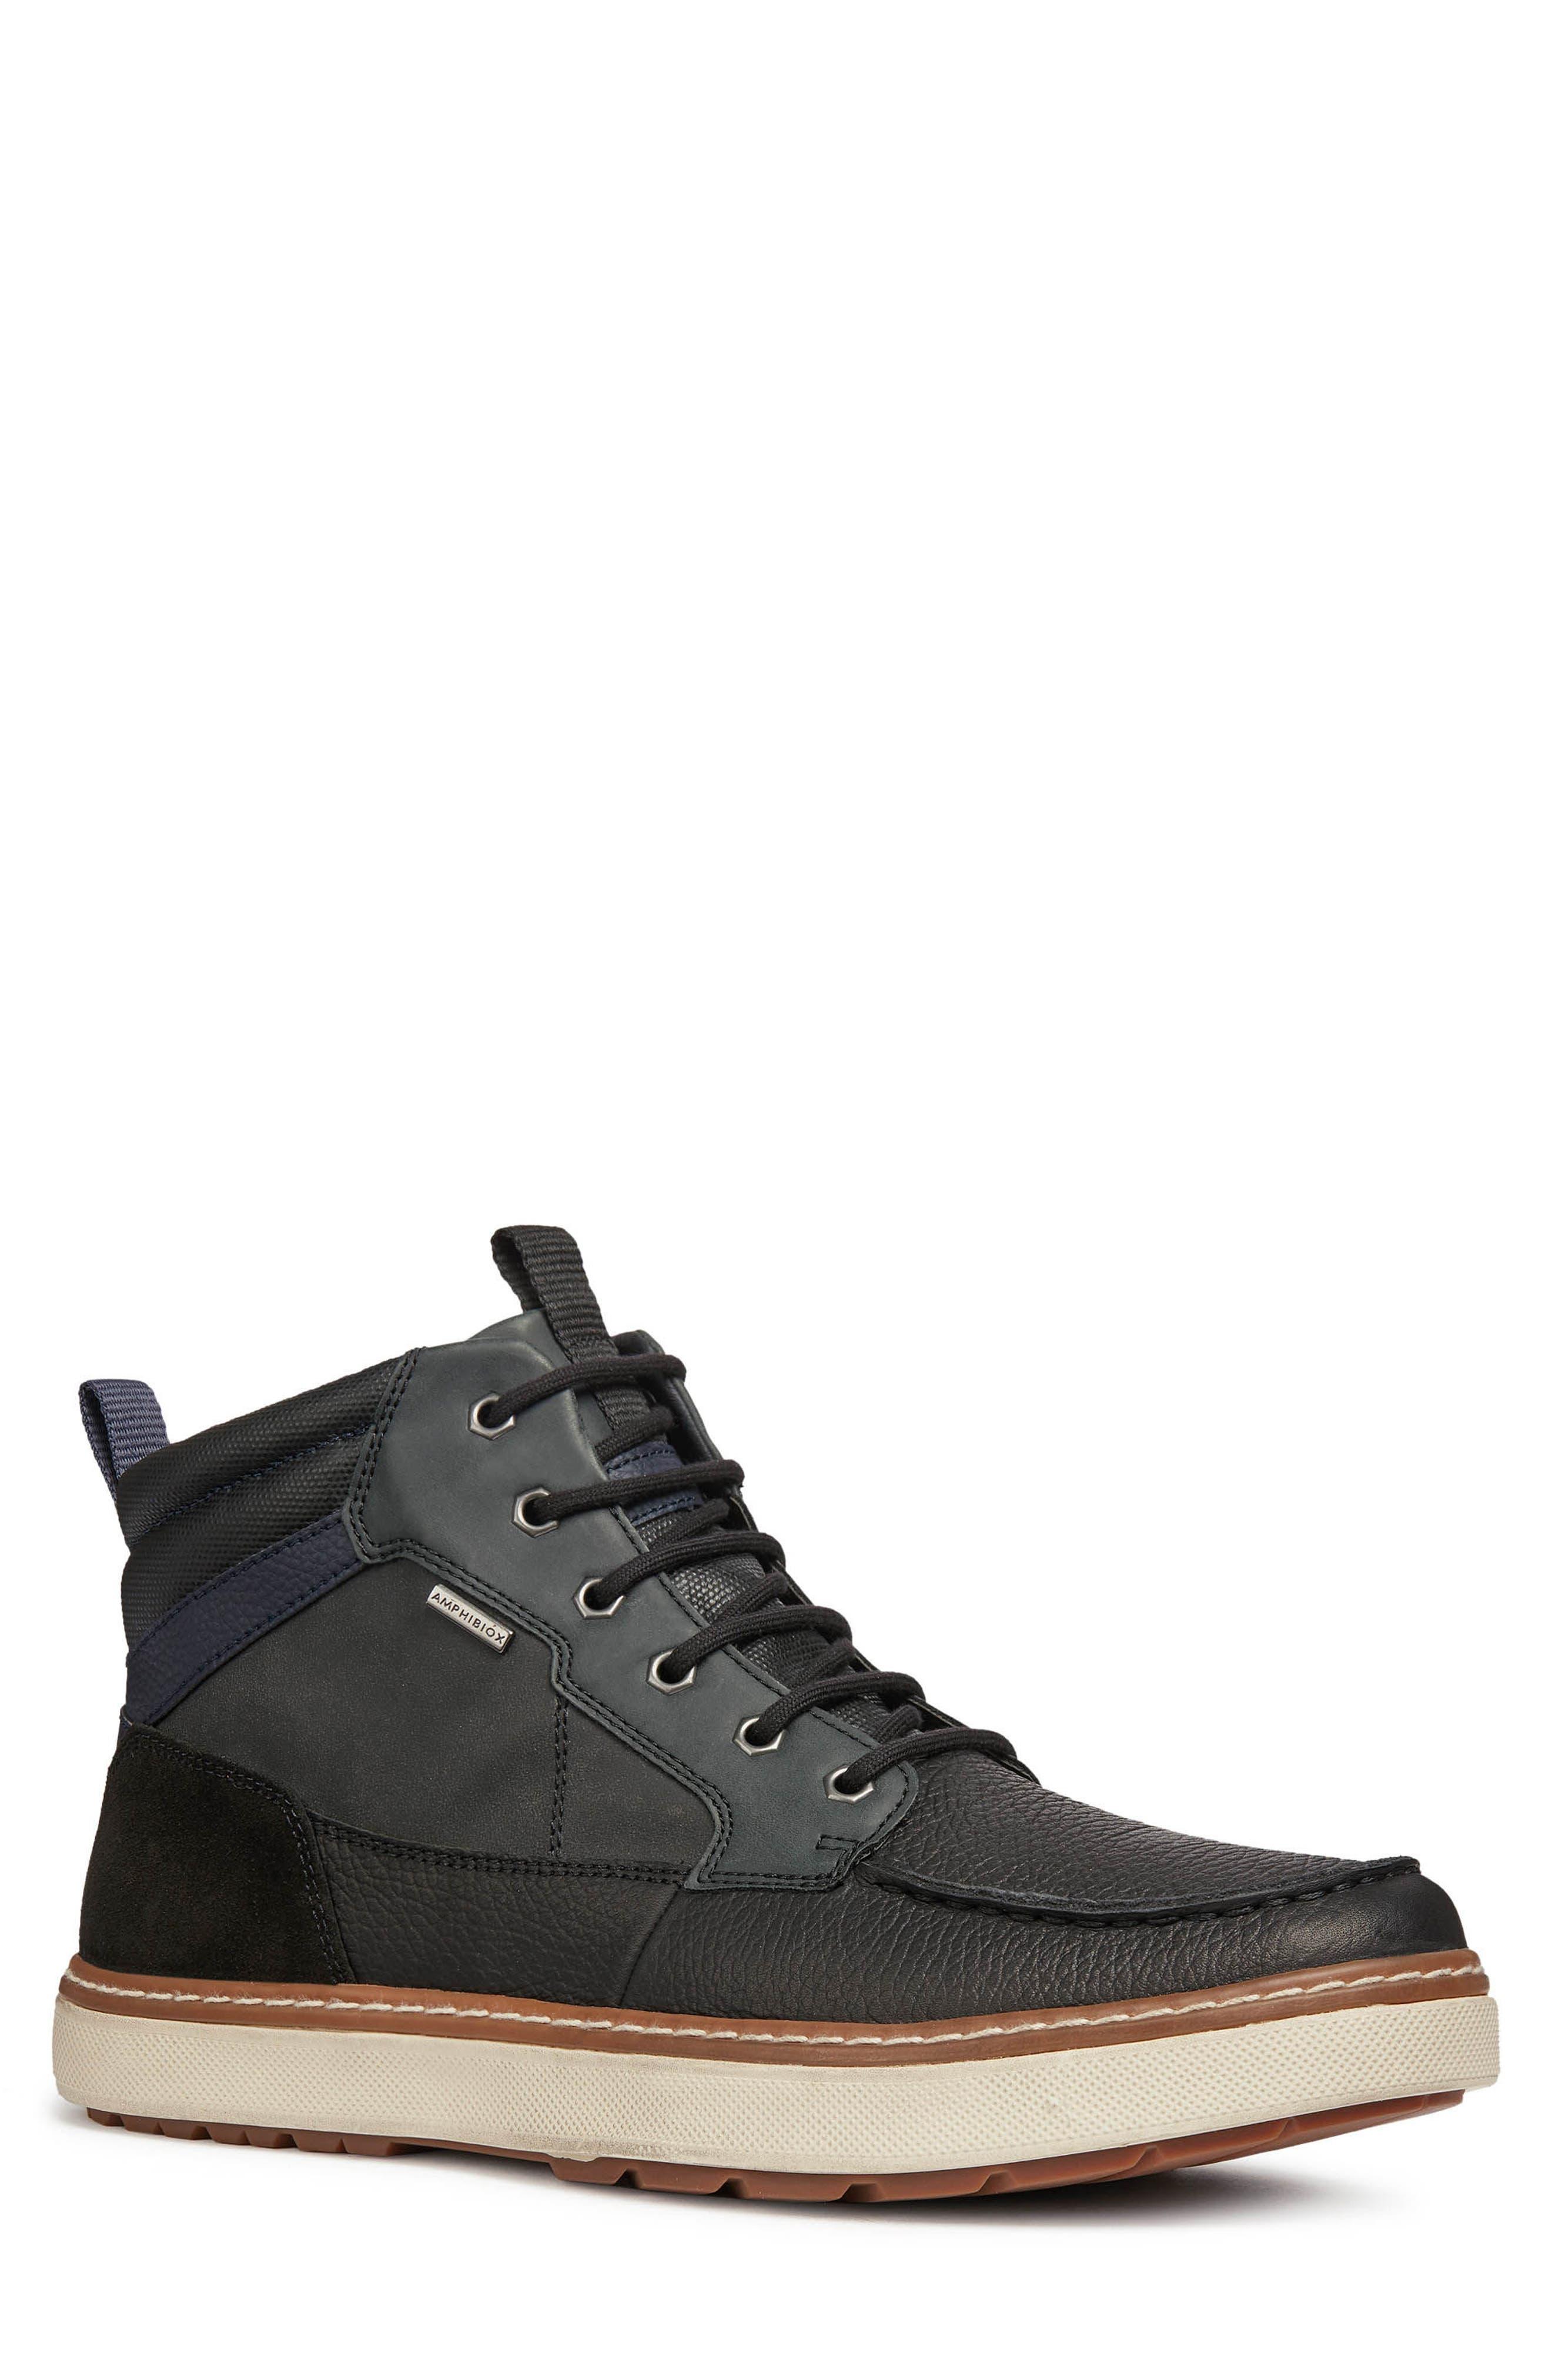 Geox Mattias Abs 22 Waterproof Boot, Black